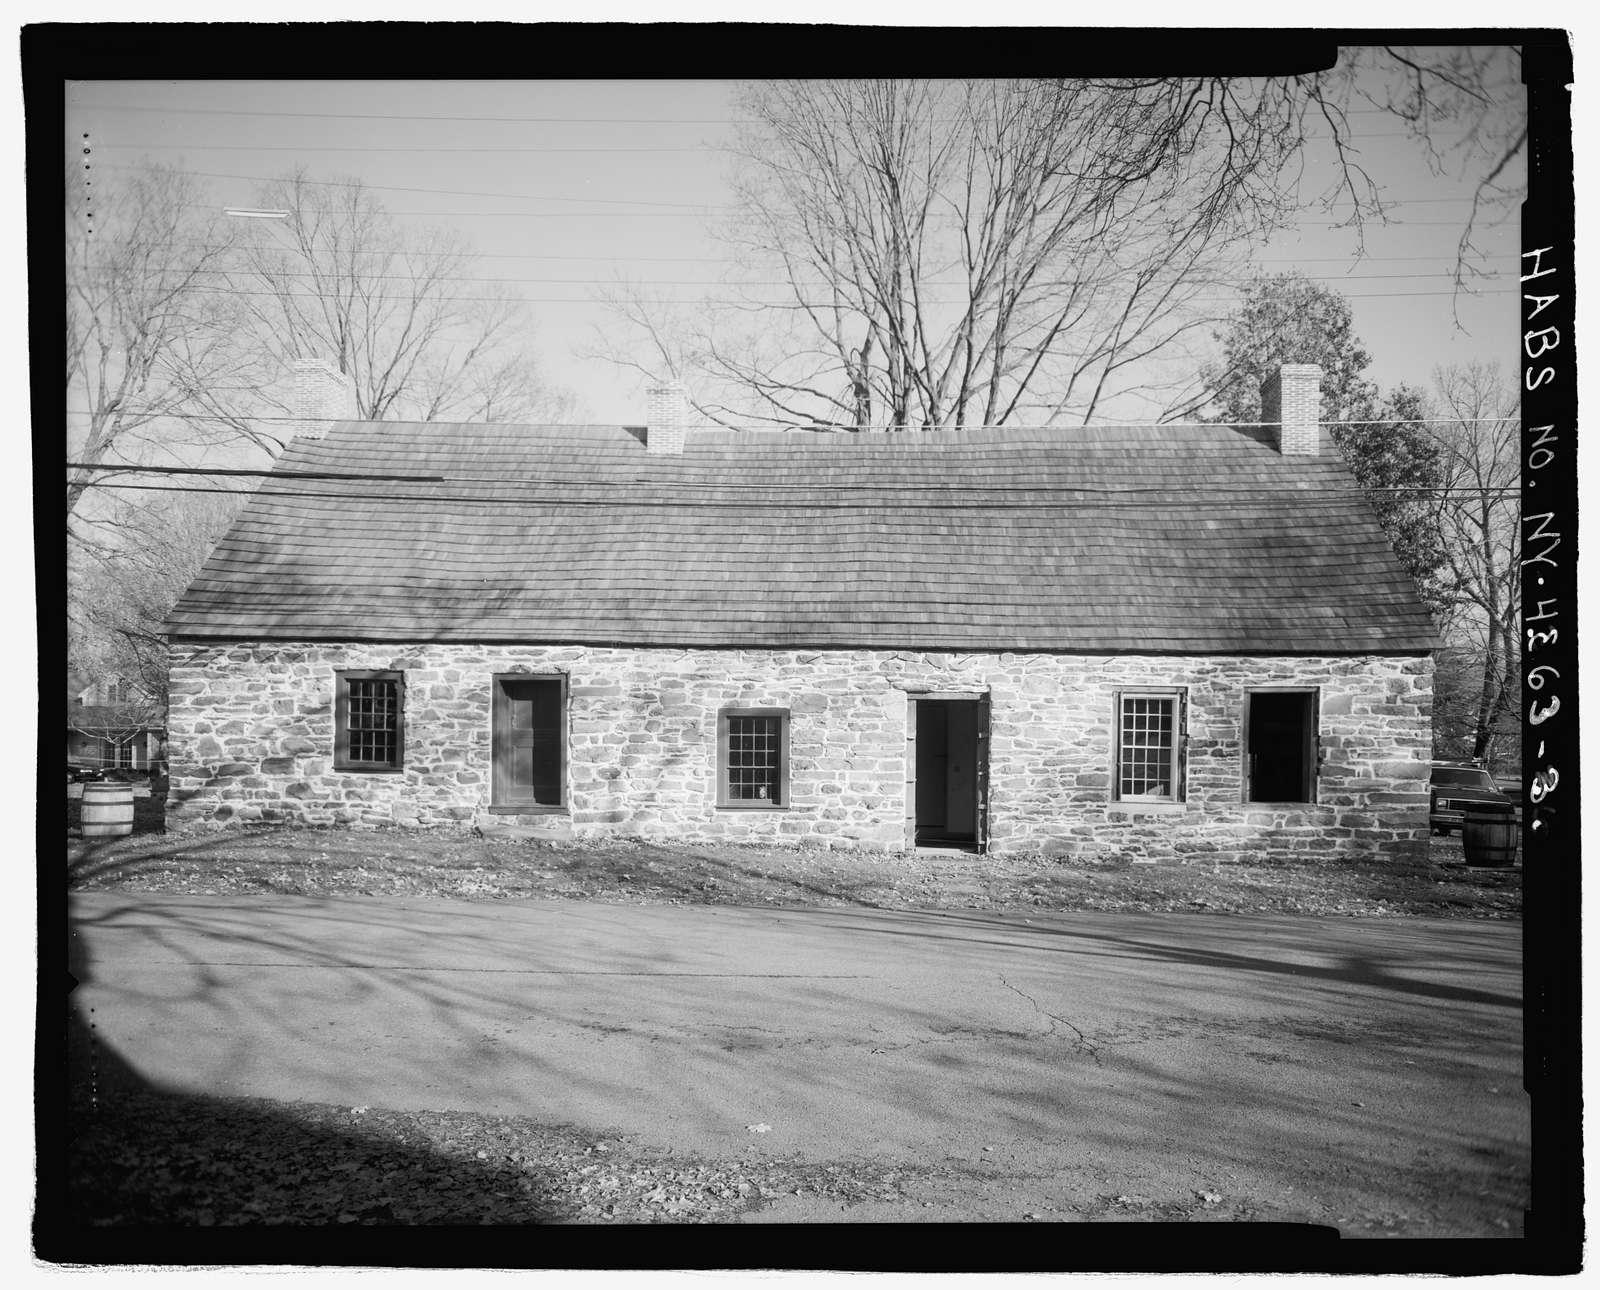 Abraham Hasbrouck House, 94 Huguenot Street, New Paltz, Ulster County, NY